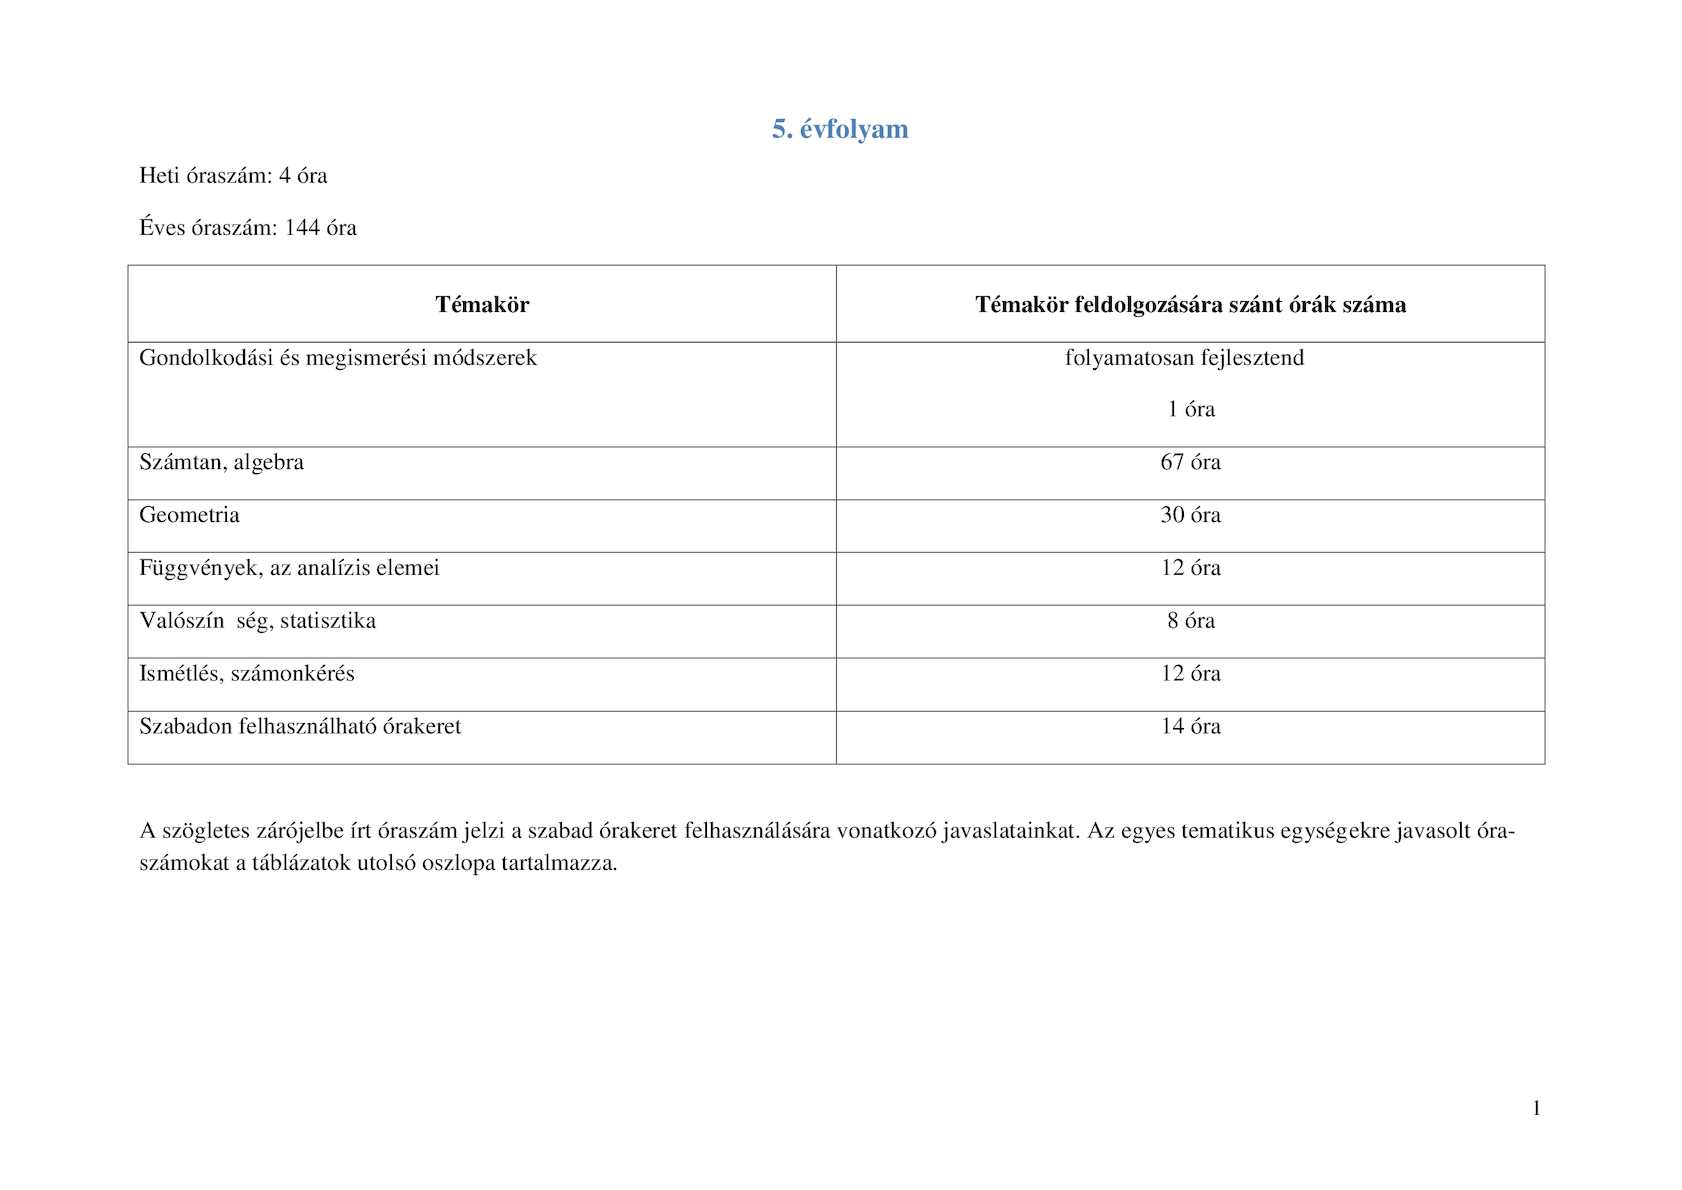 coldrex magas vérnyomás esetén chophytol magas vérnyomás esetén